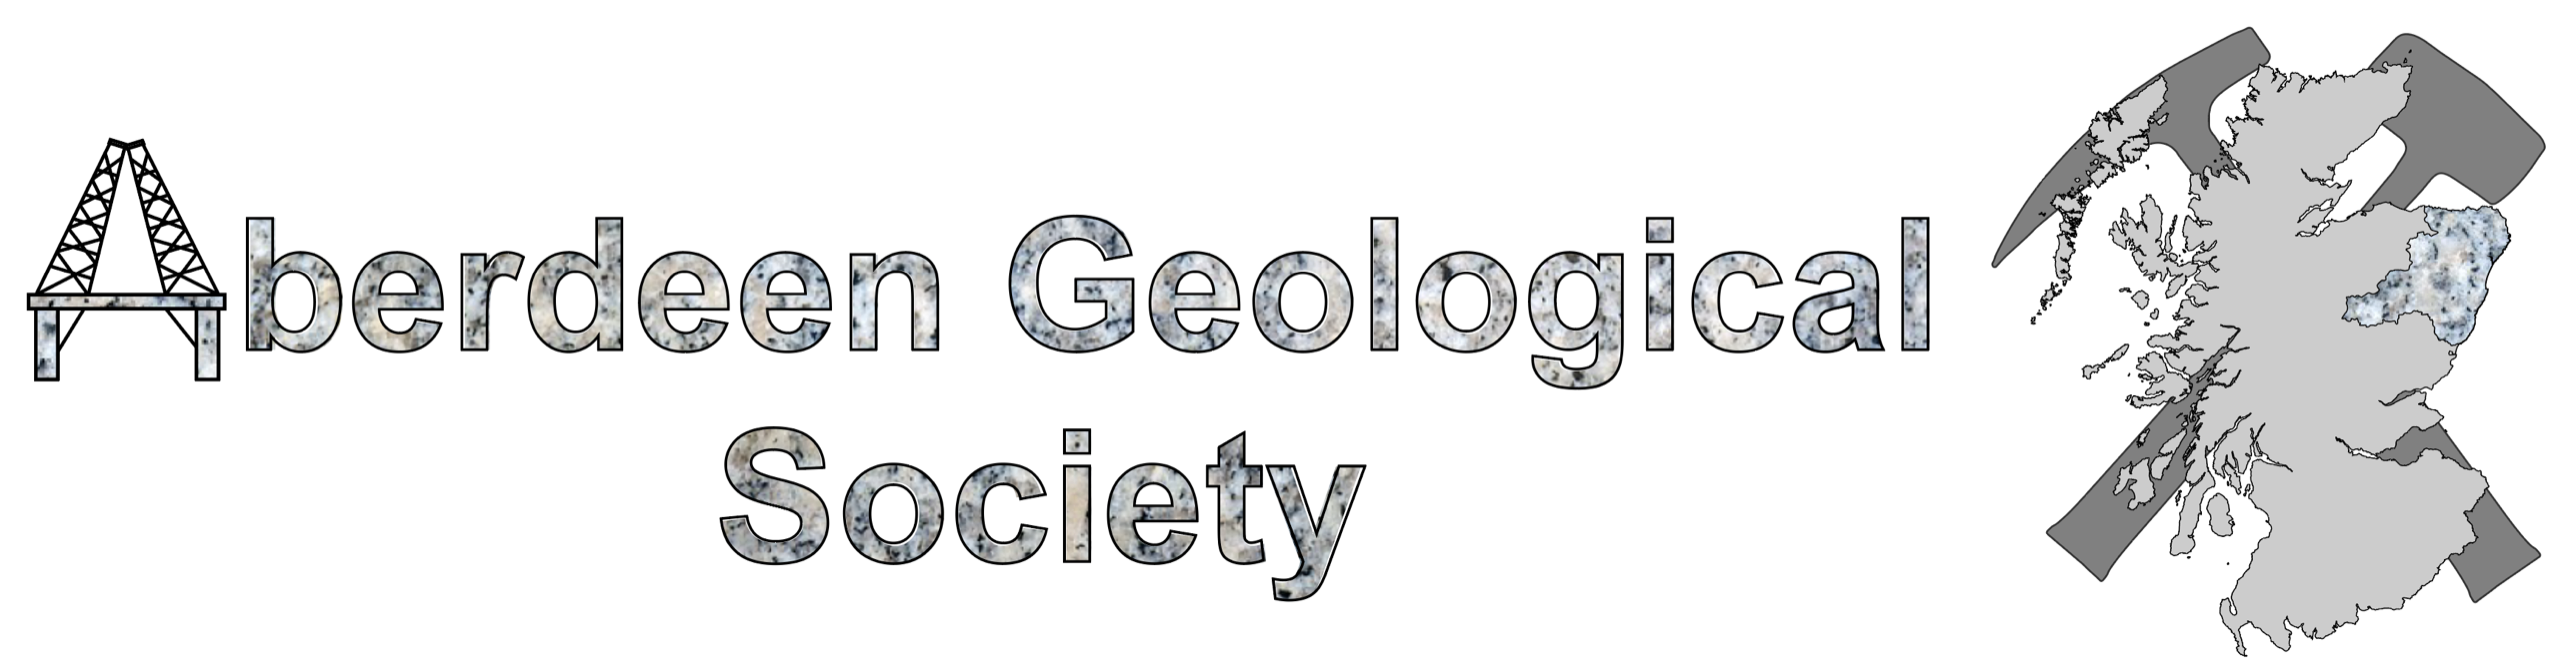 Aberdeen Geological Society